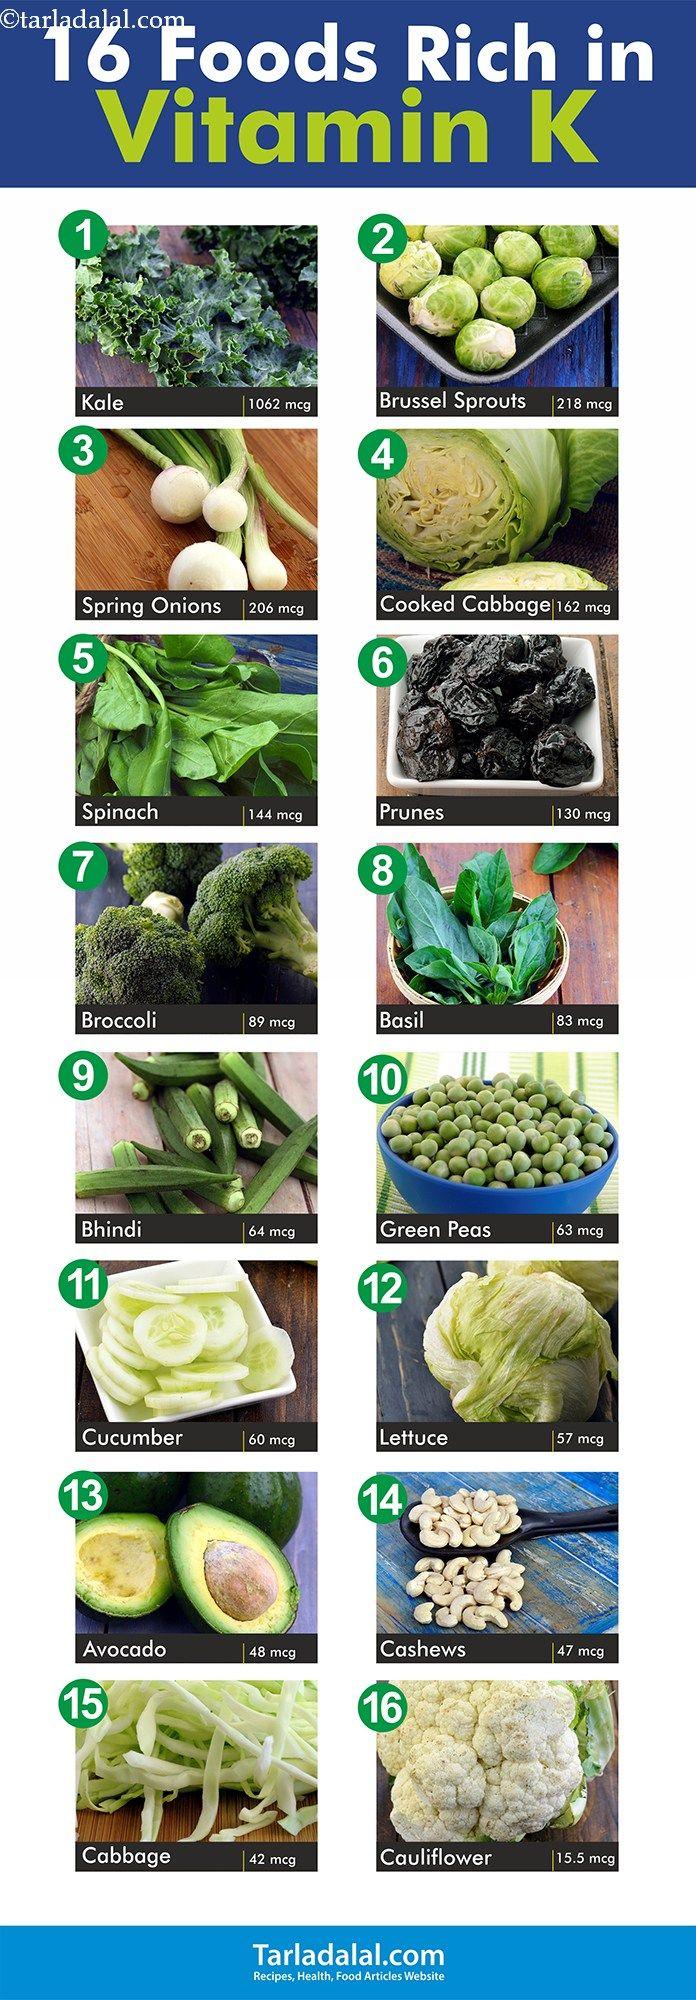 Vitamin K Diet, Recipes, Benefits + Foods Rich in Vitamin